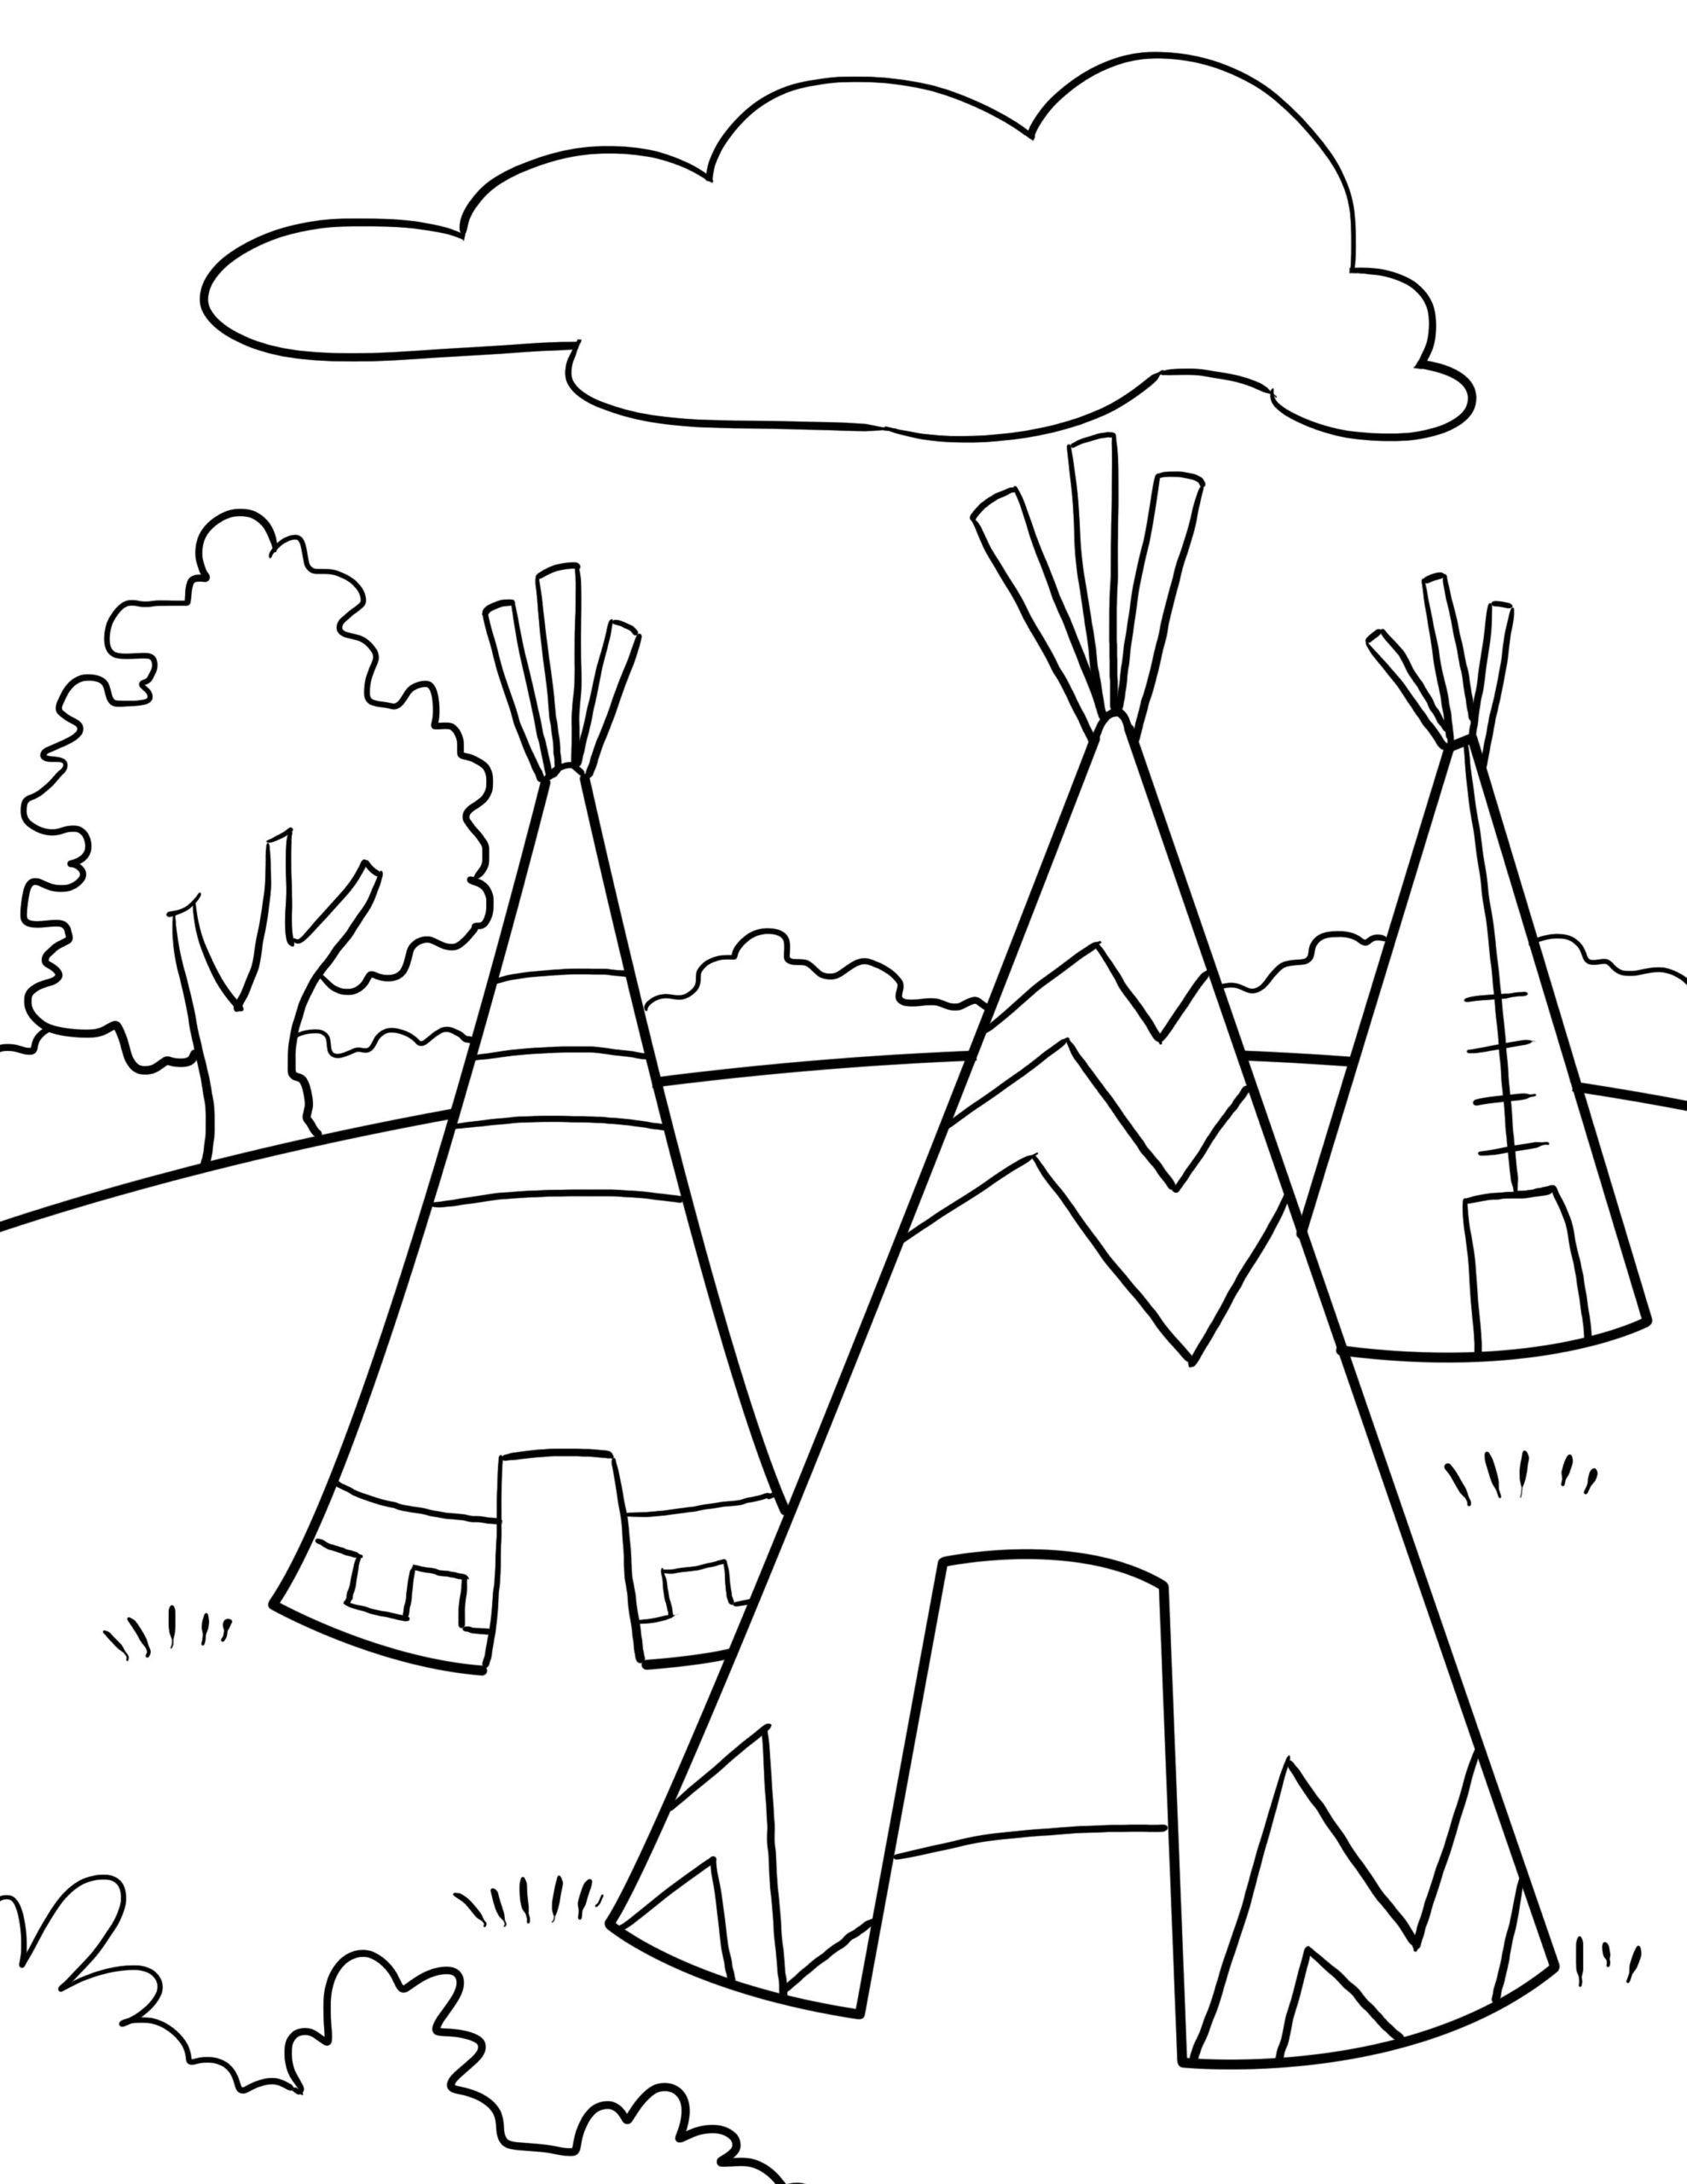 3rd Grade Christmas Worksheets Worksheet For Kids